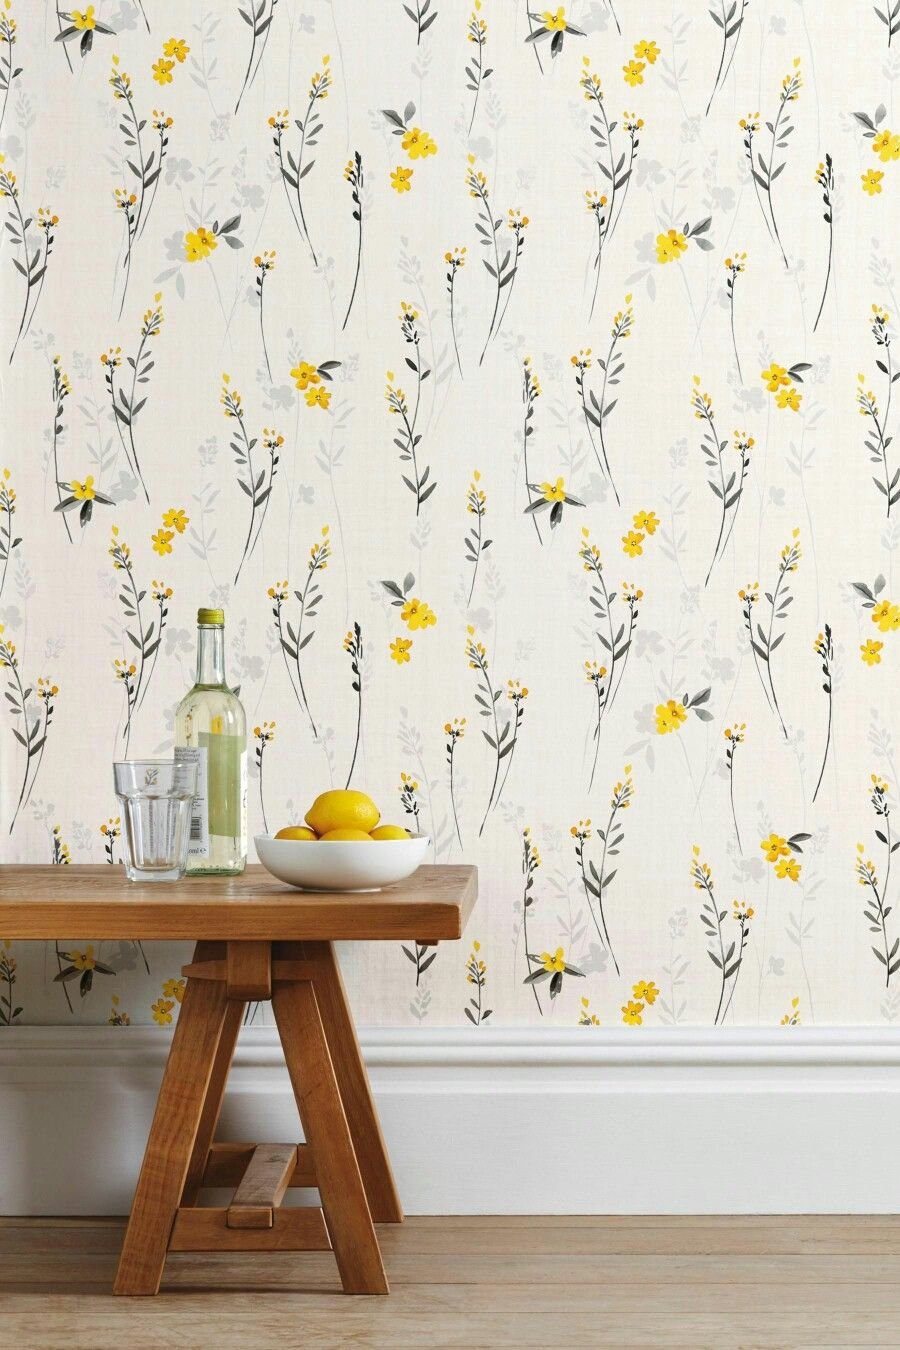 pin by kerry chalmers on lounge mood board kitchen wallpaper rh pinterest com